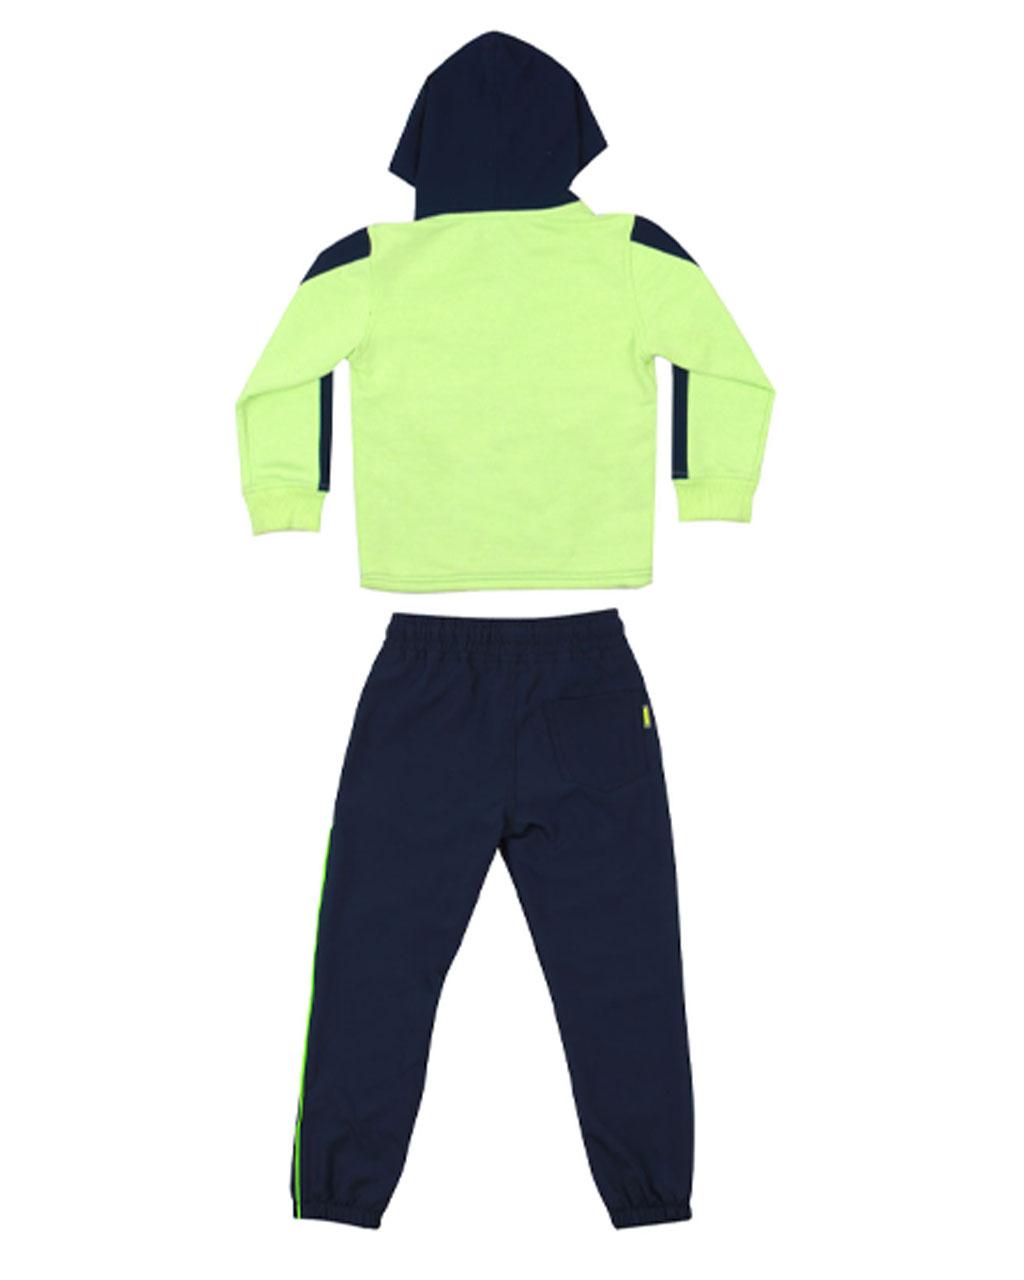 Conjunto Infantil Masculino Blusa Moleton Neon Music com Calça Azul Banana Danger